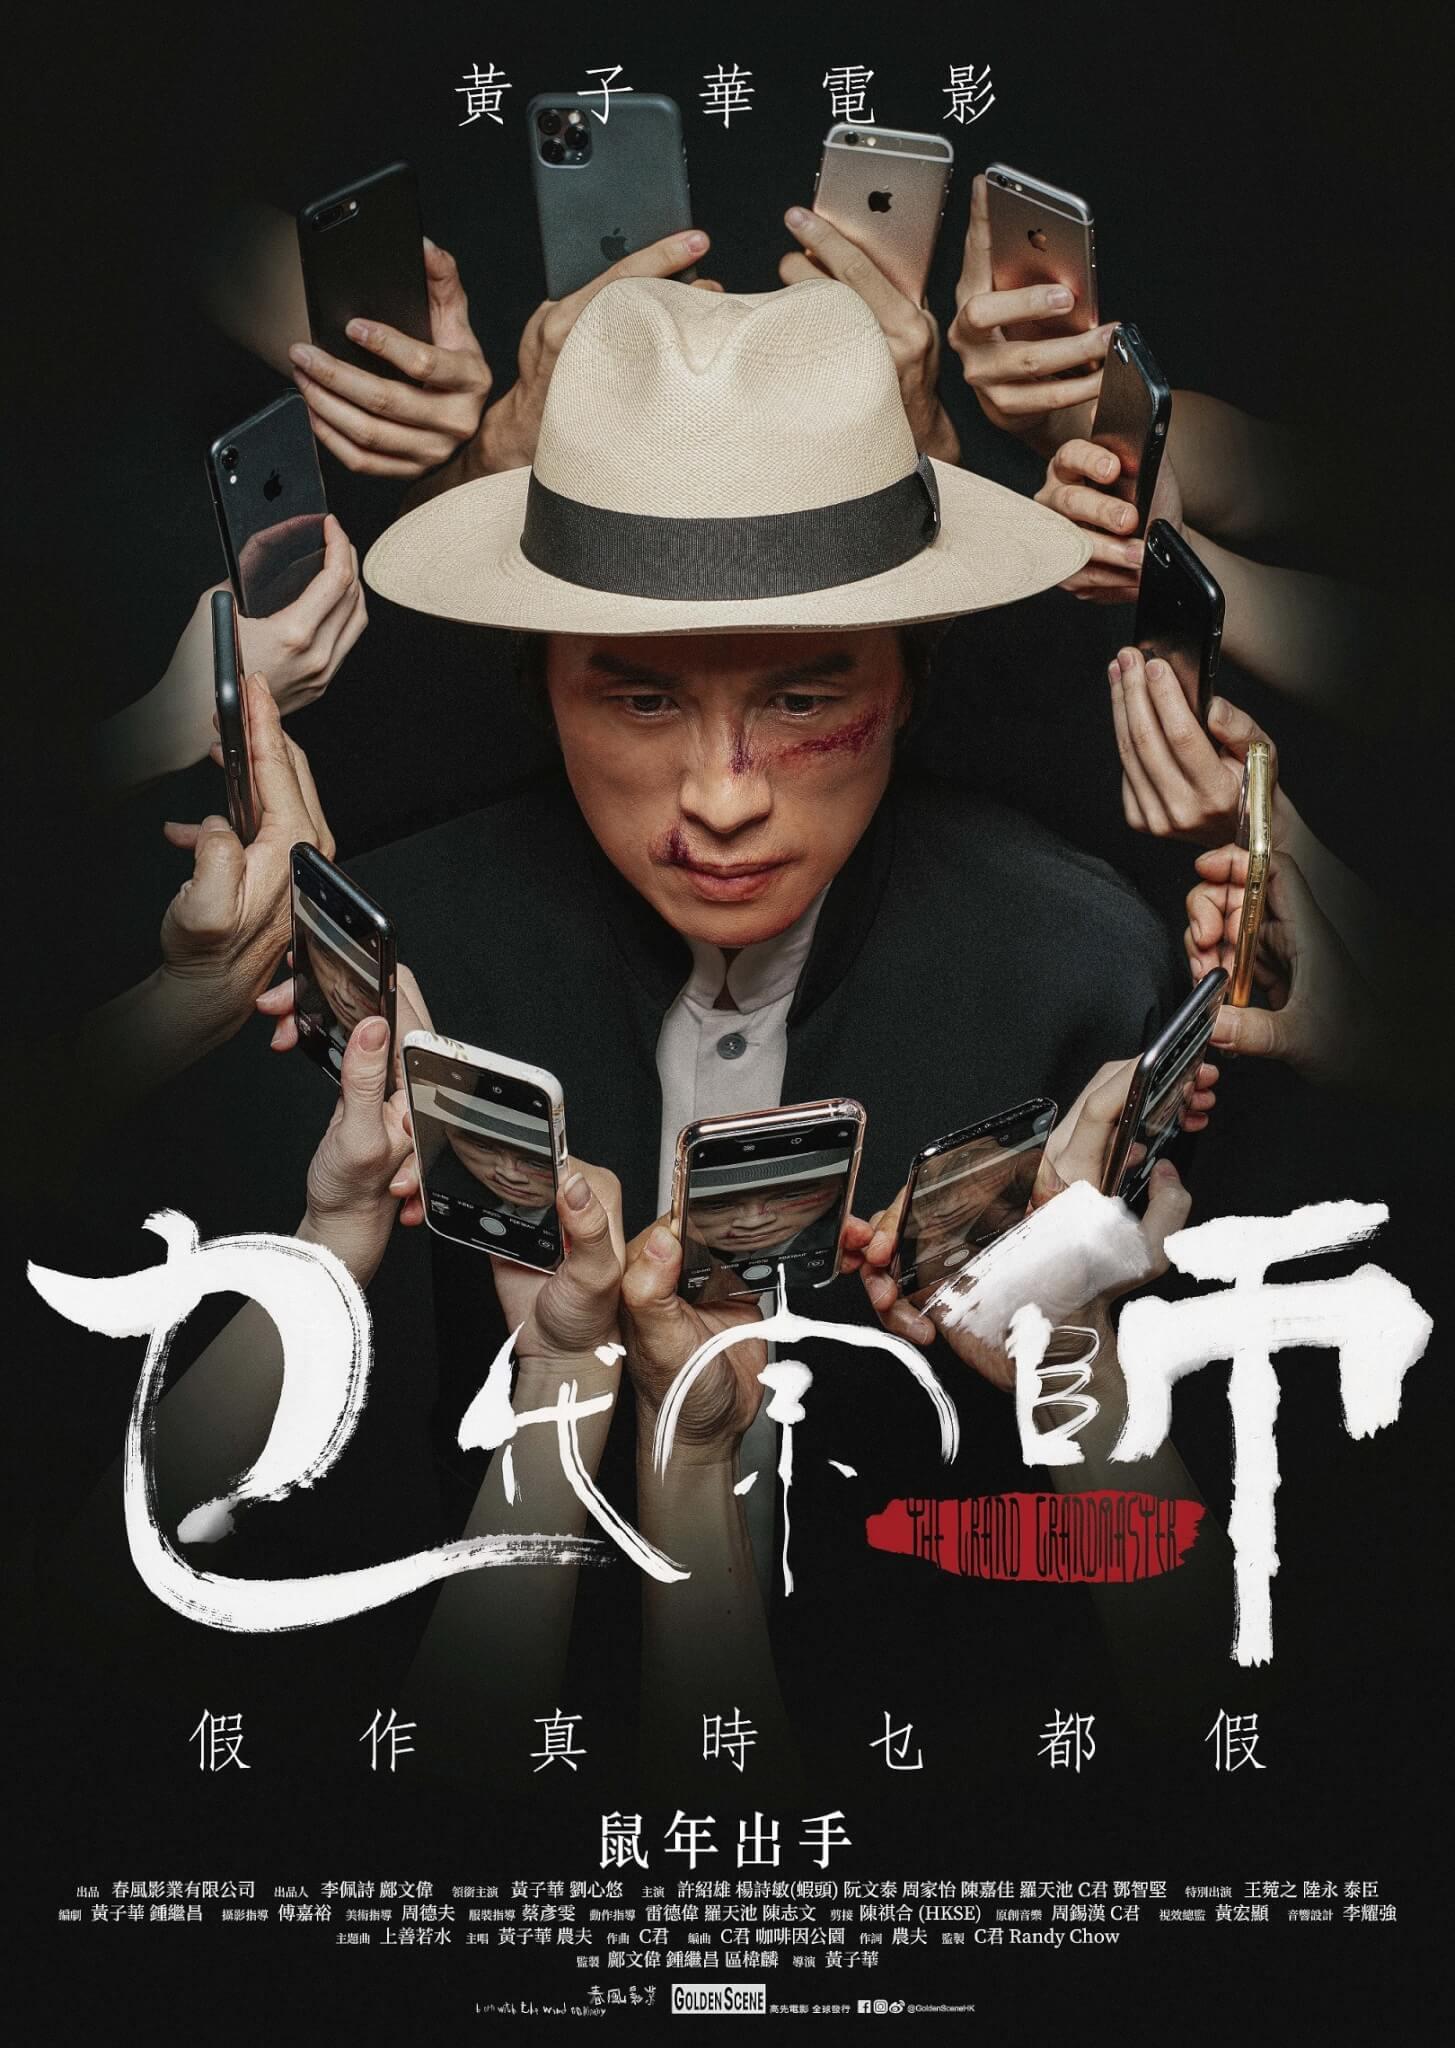 20191219-movie-poster2